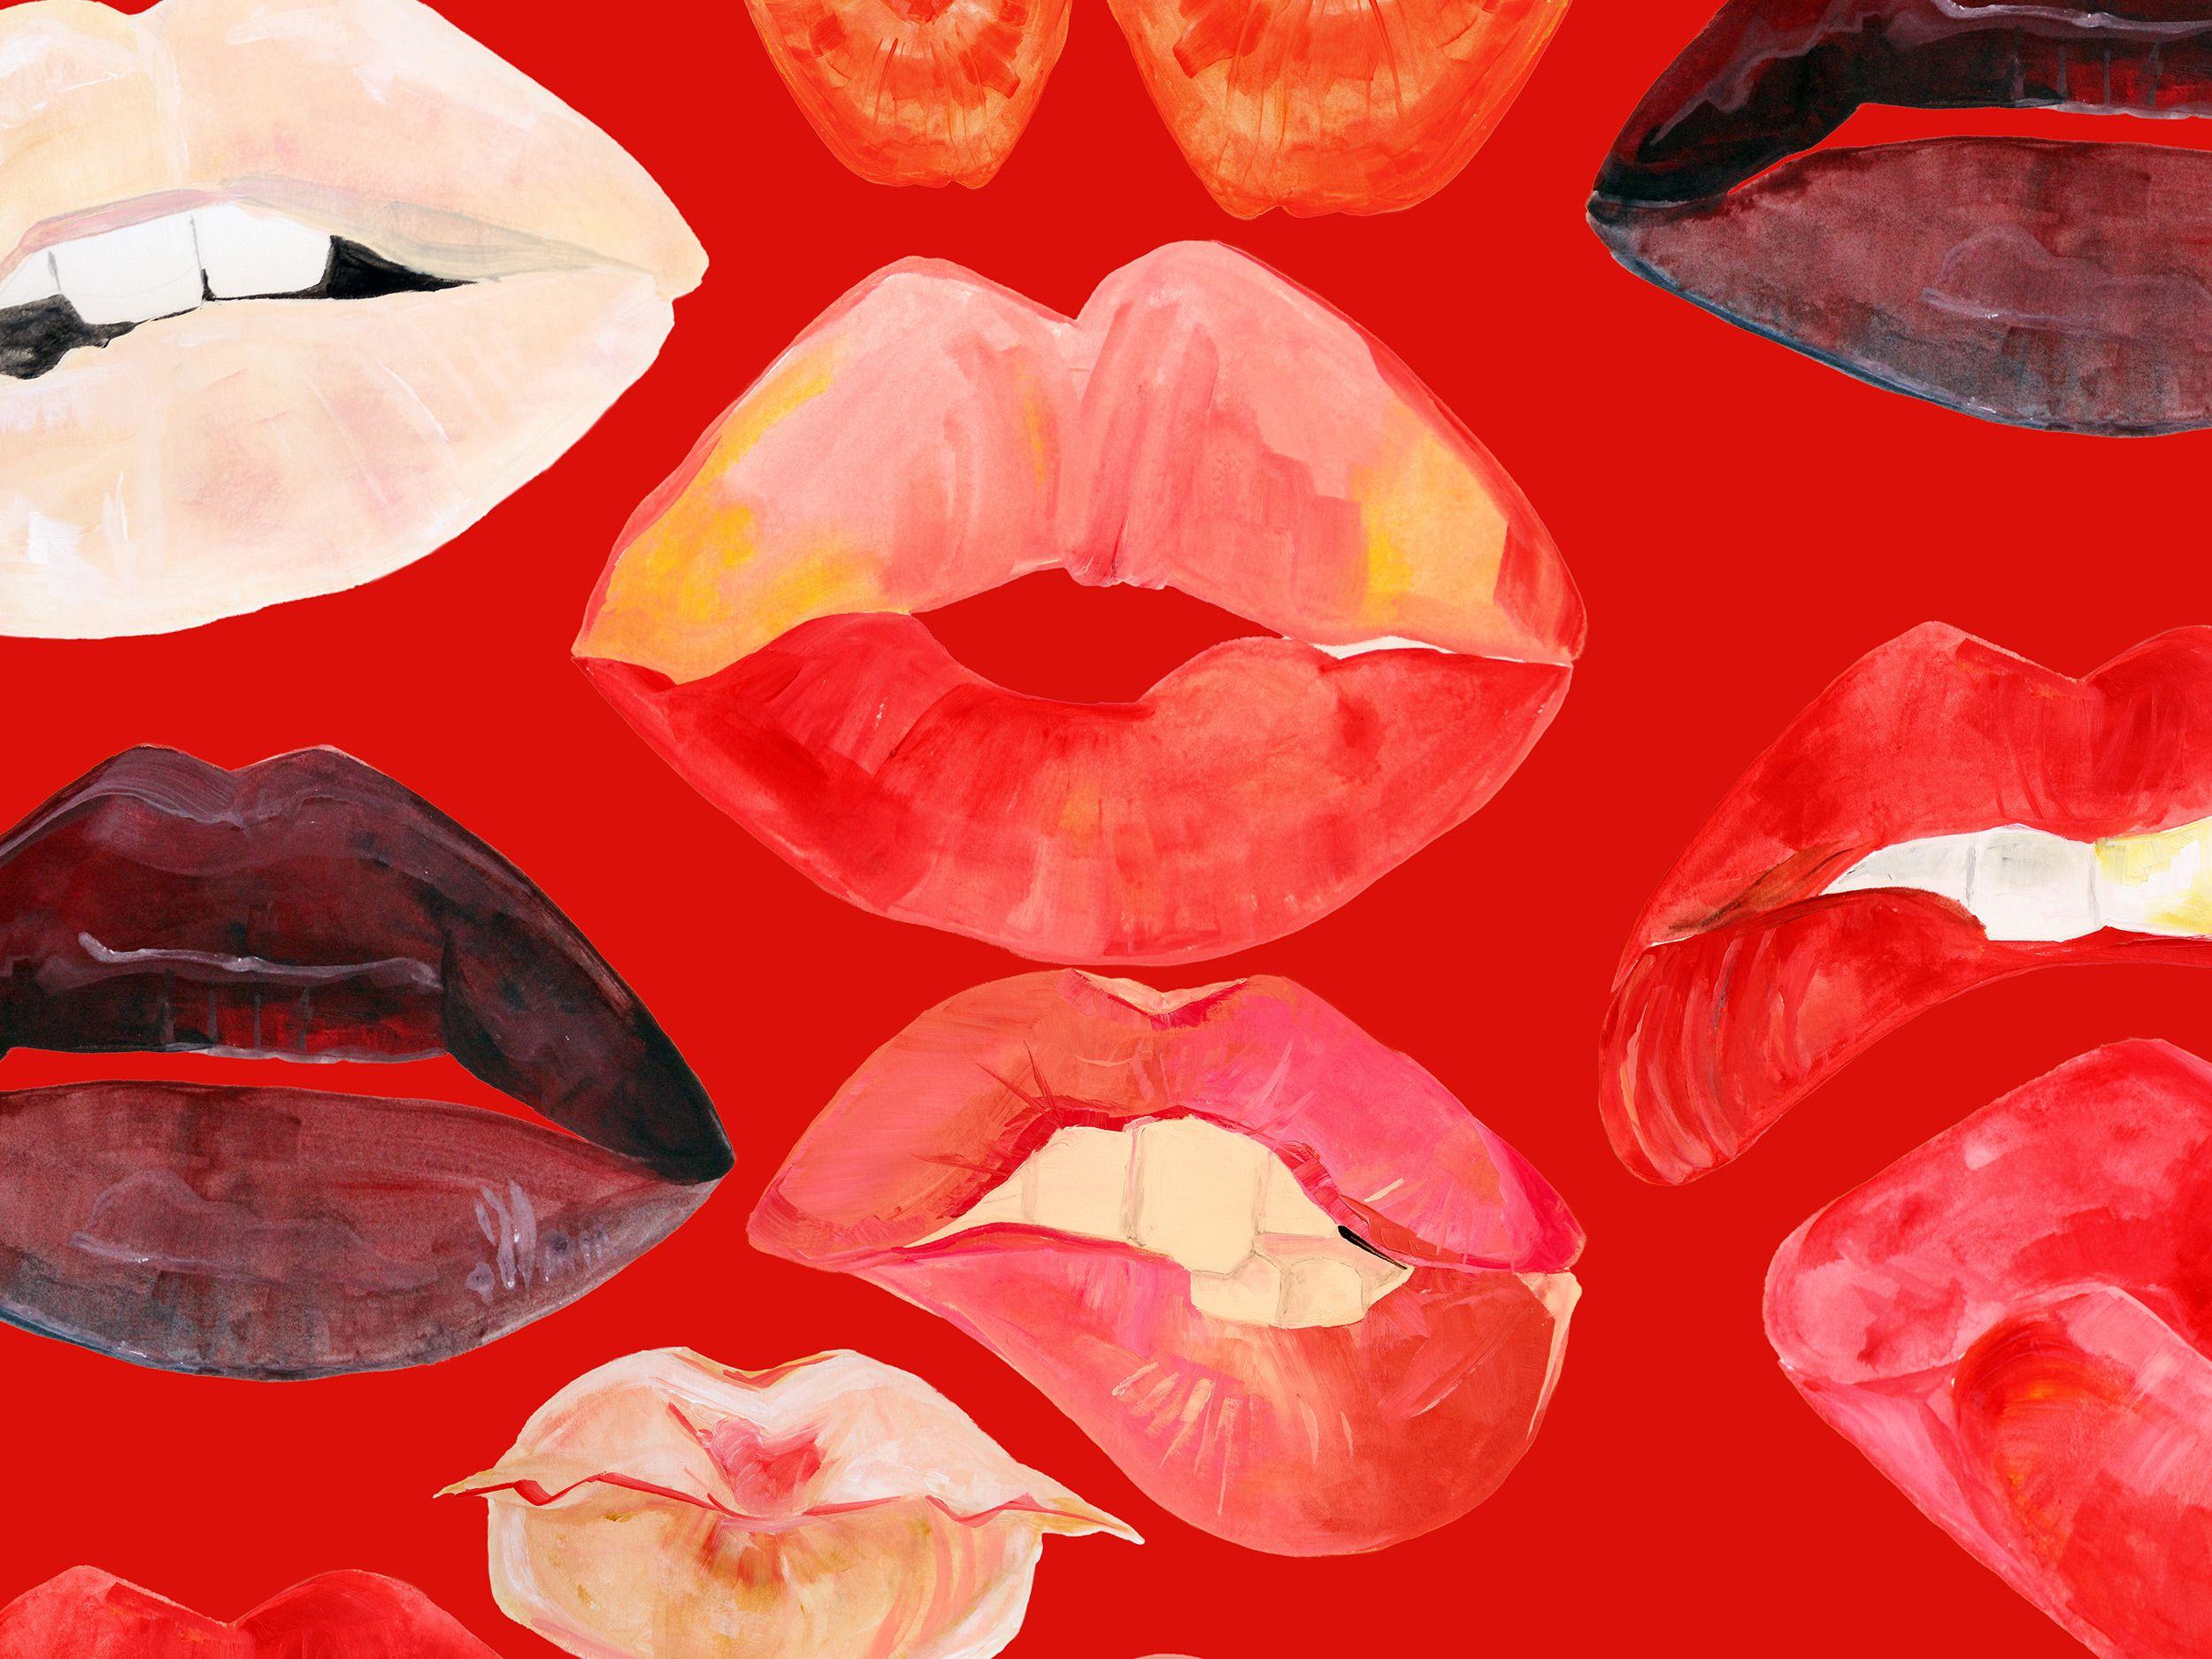 Lips Tumblr Wallpapers Wallpaper Cave